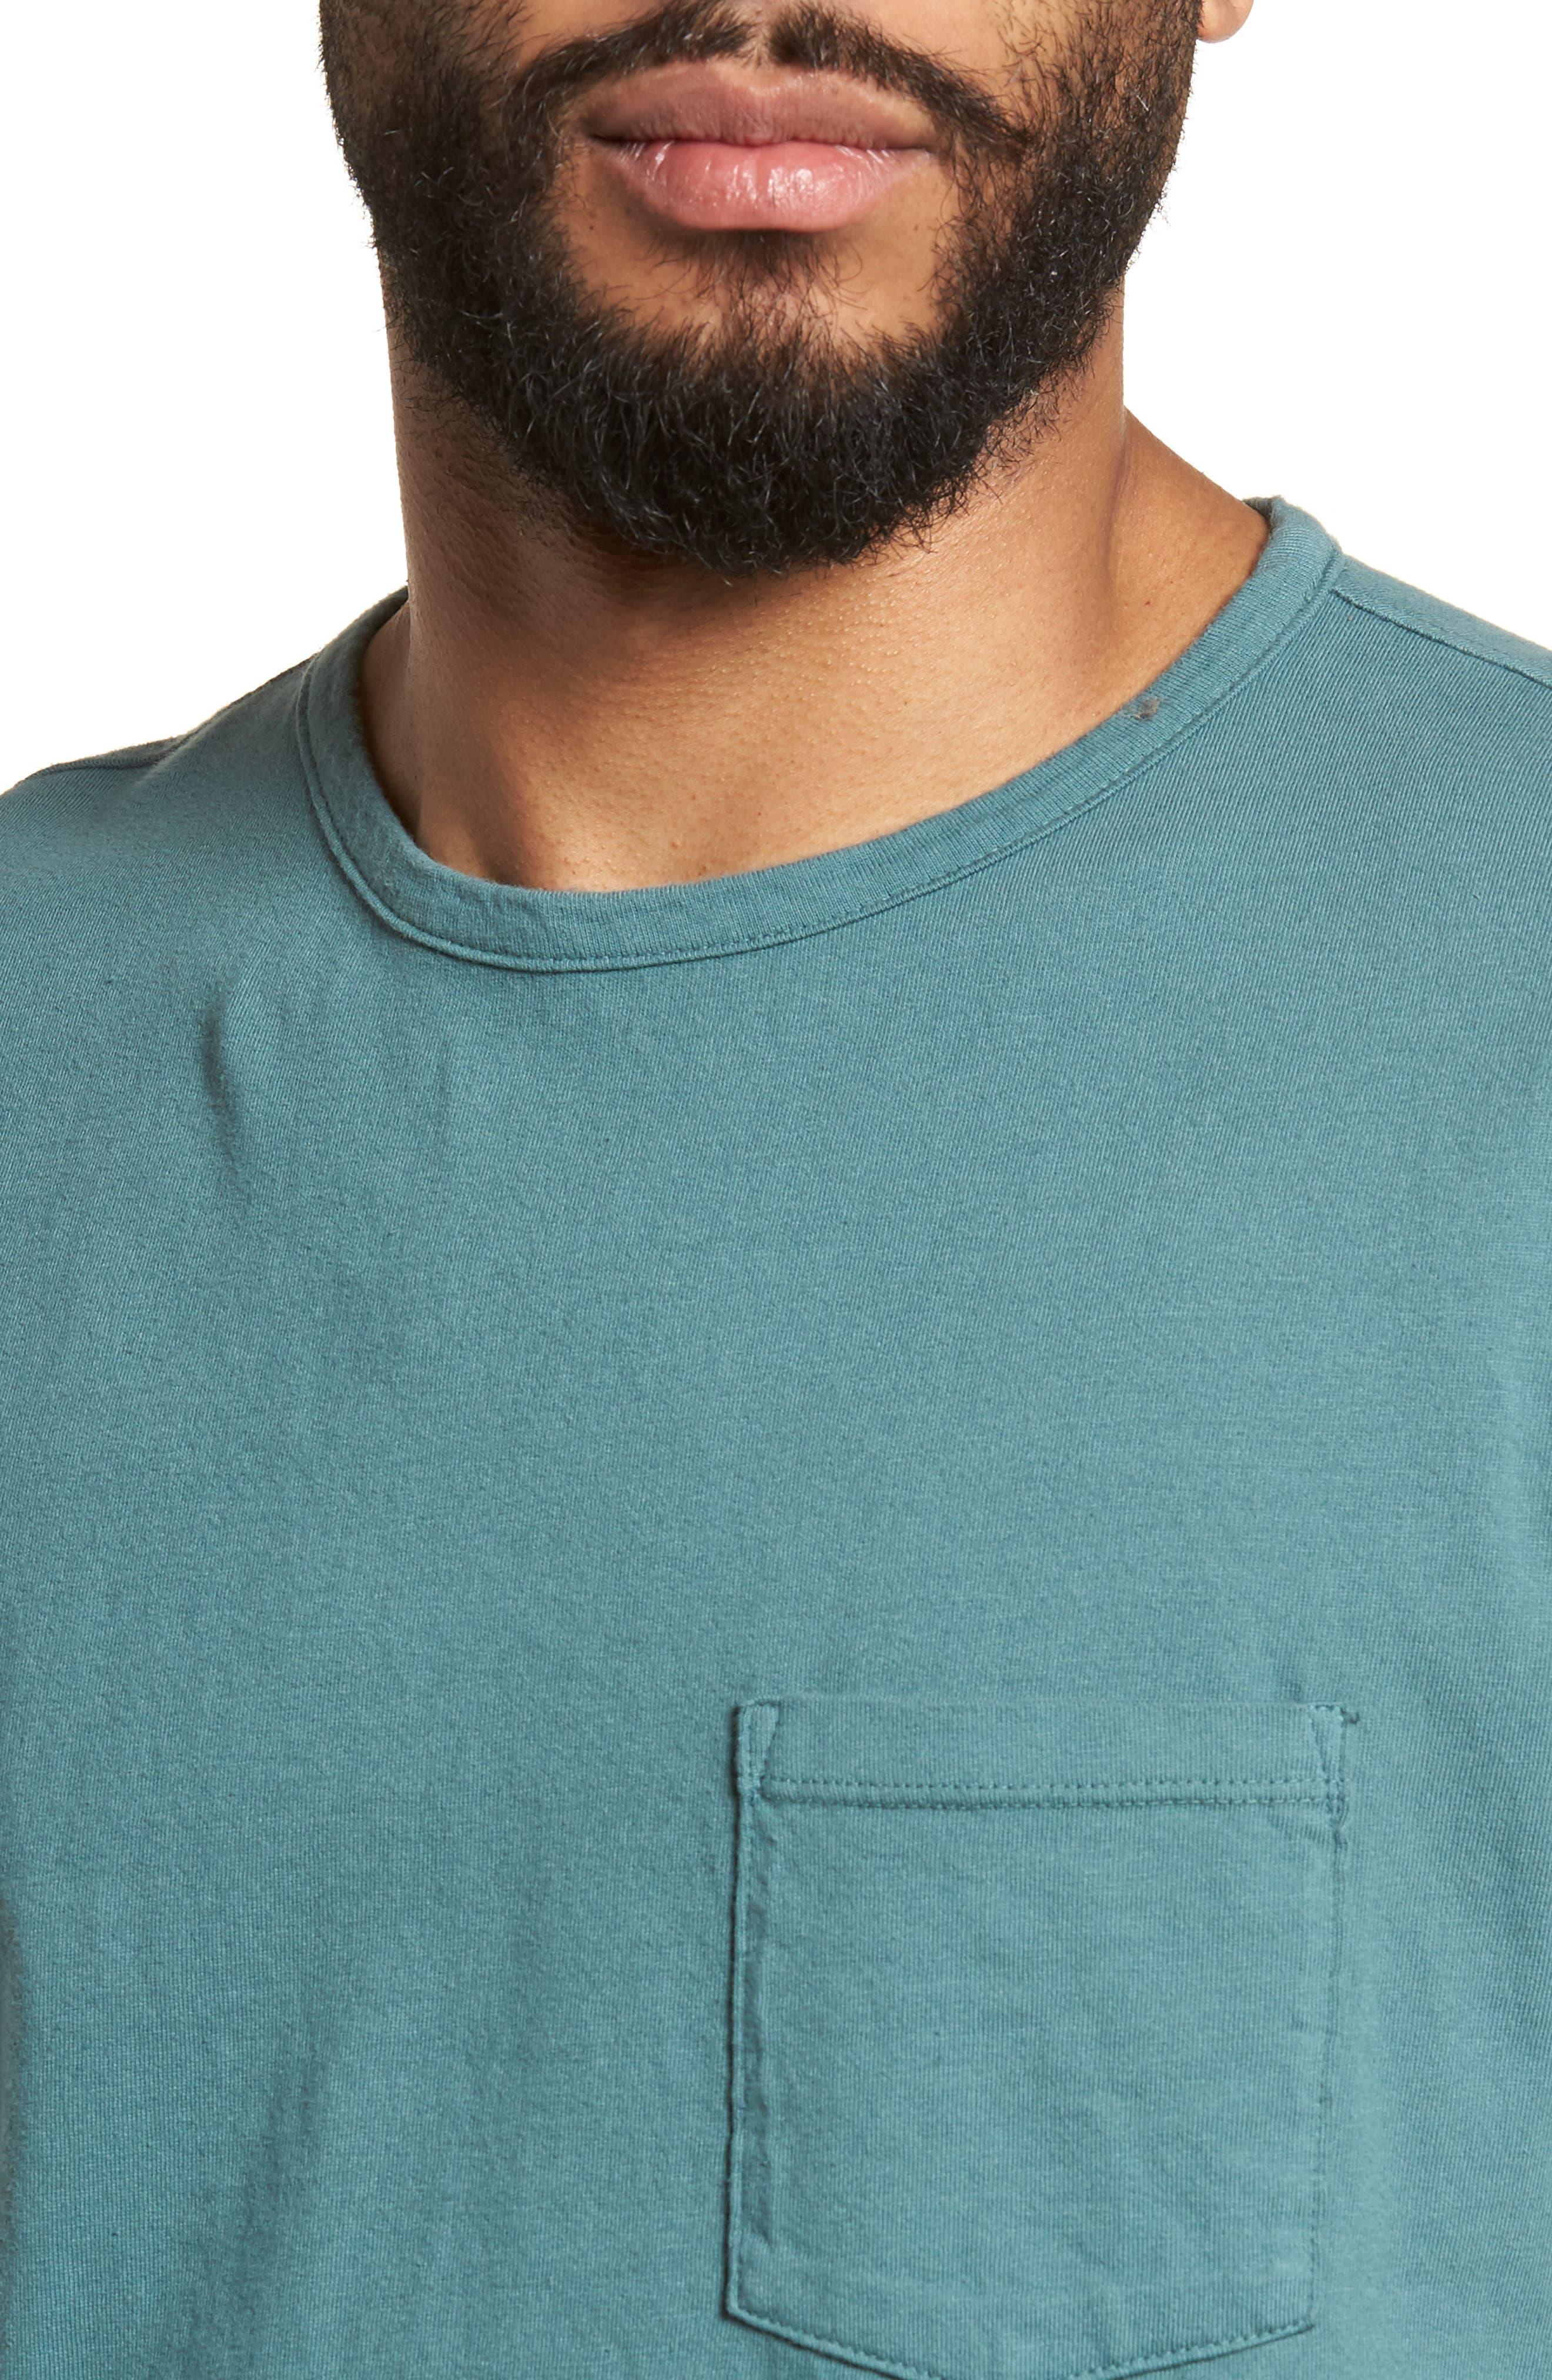 Pocket T-Shirt,                             Alternate thumbnail 4, color,                             Aqua